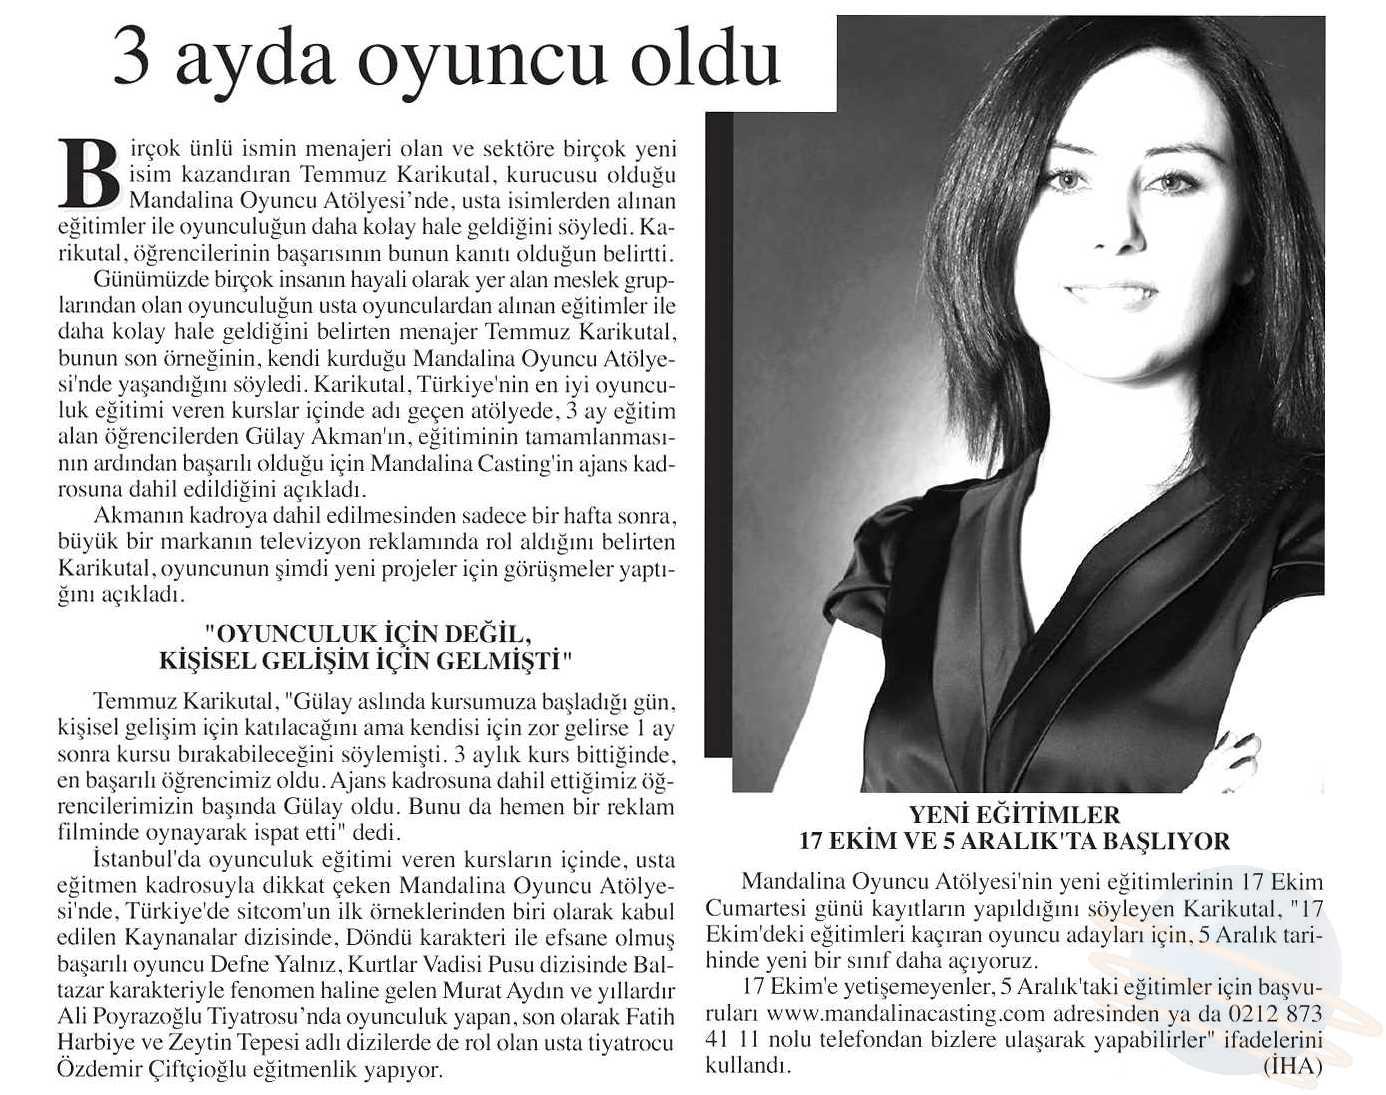 Mandalina Oyuncu Atölyesi Gülay Akman - İstanbul Gazetesi